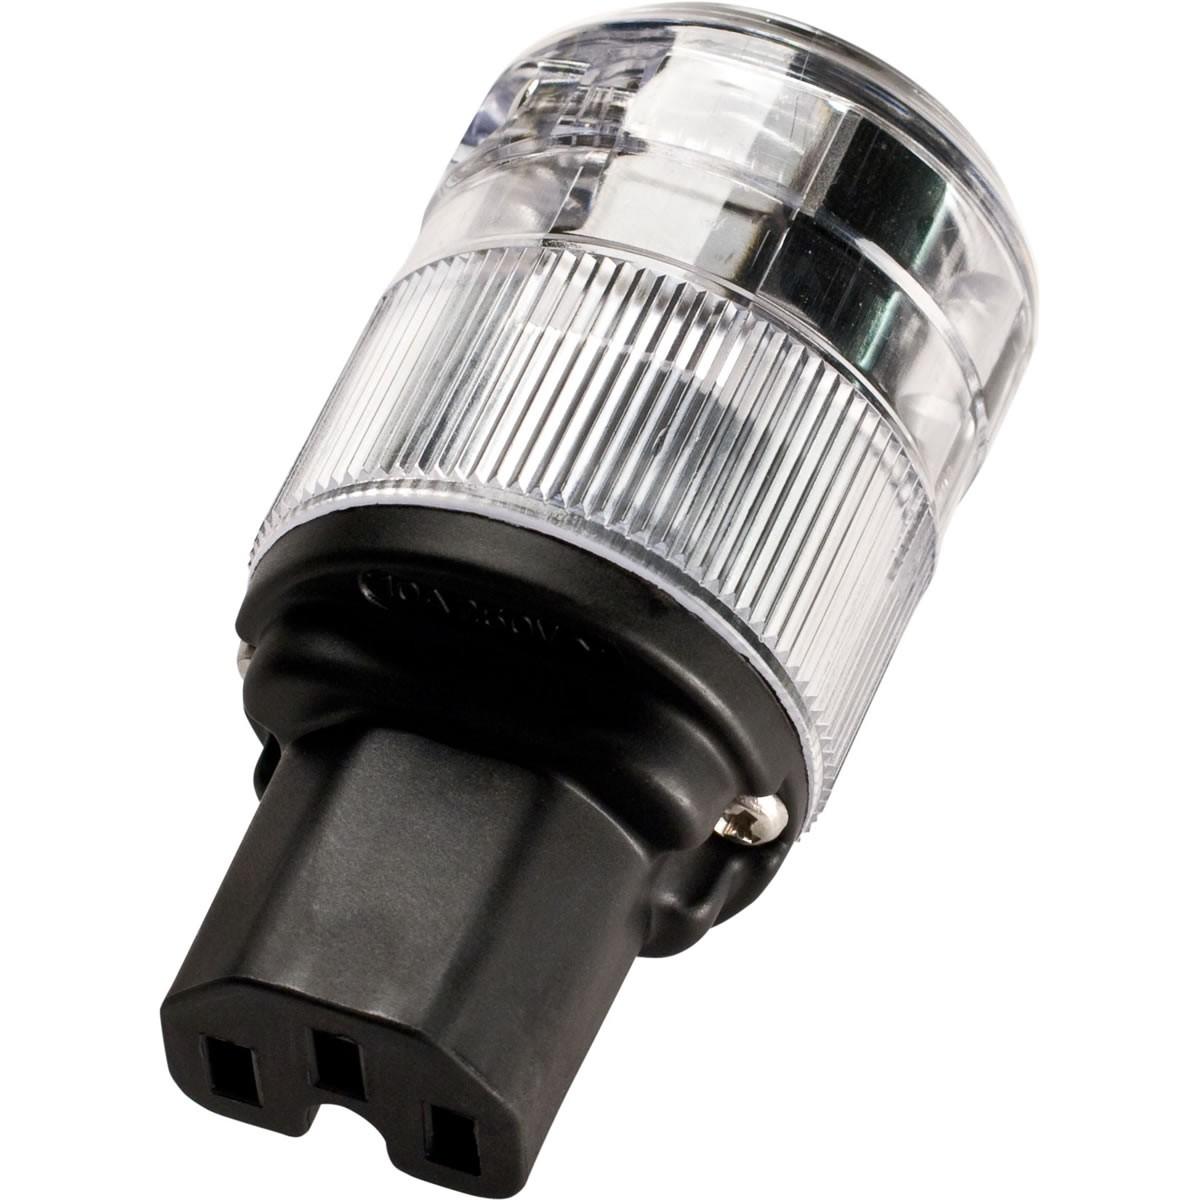 WATTGATE 320i Connector IEC C15 Cryo Treatment Perma Lock Ø16mm Transparent